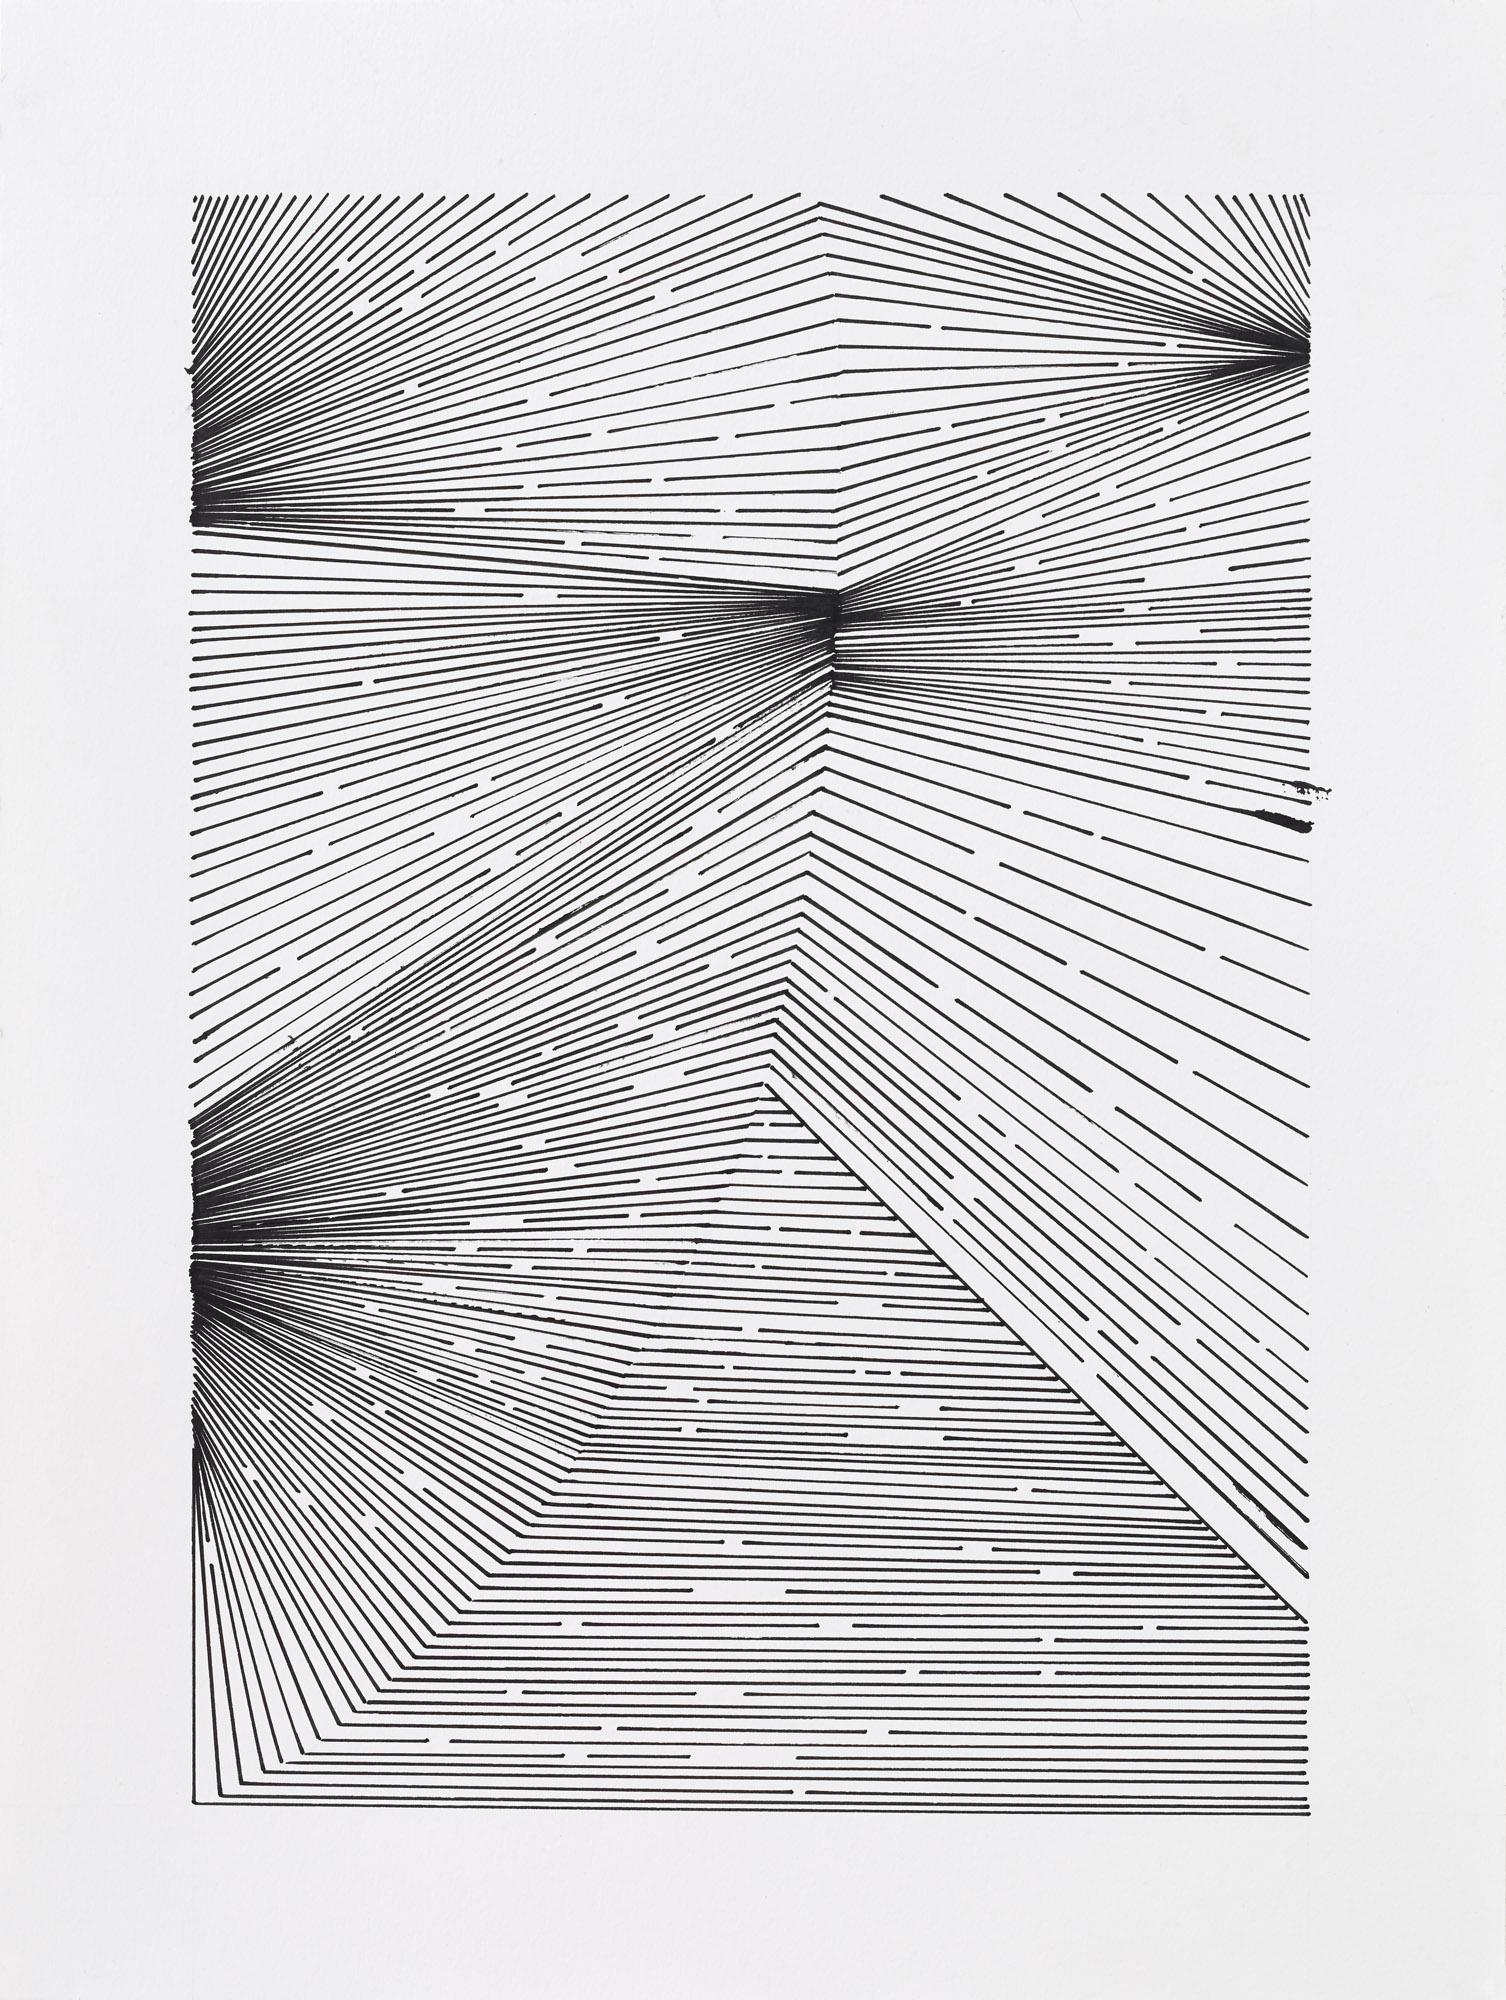 B_K_P_7515_untitled_acrylic_on_paper_40x30cm_2015